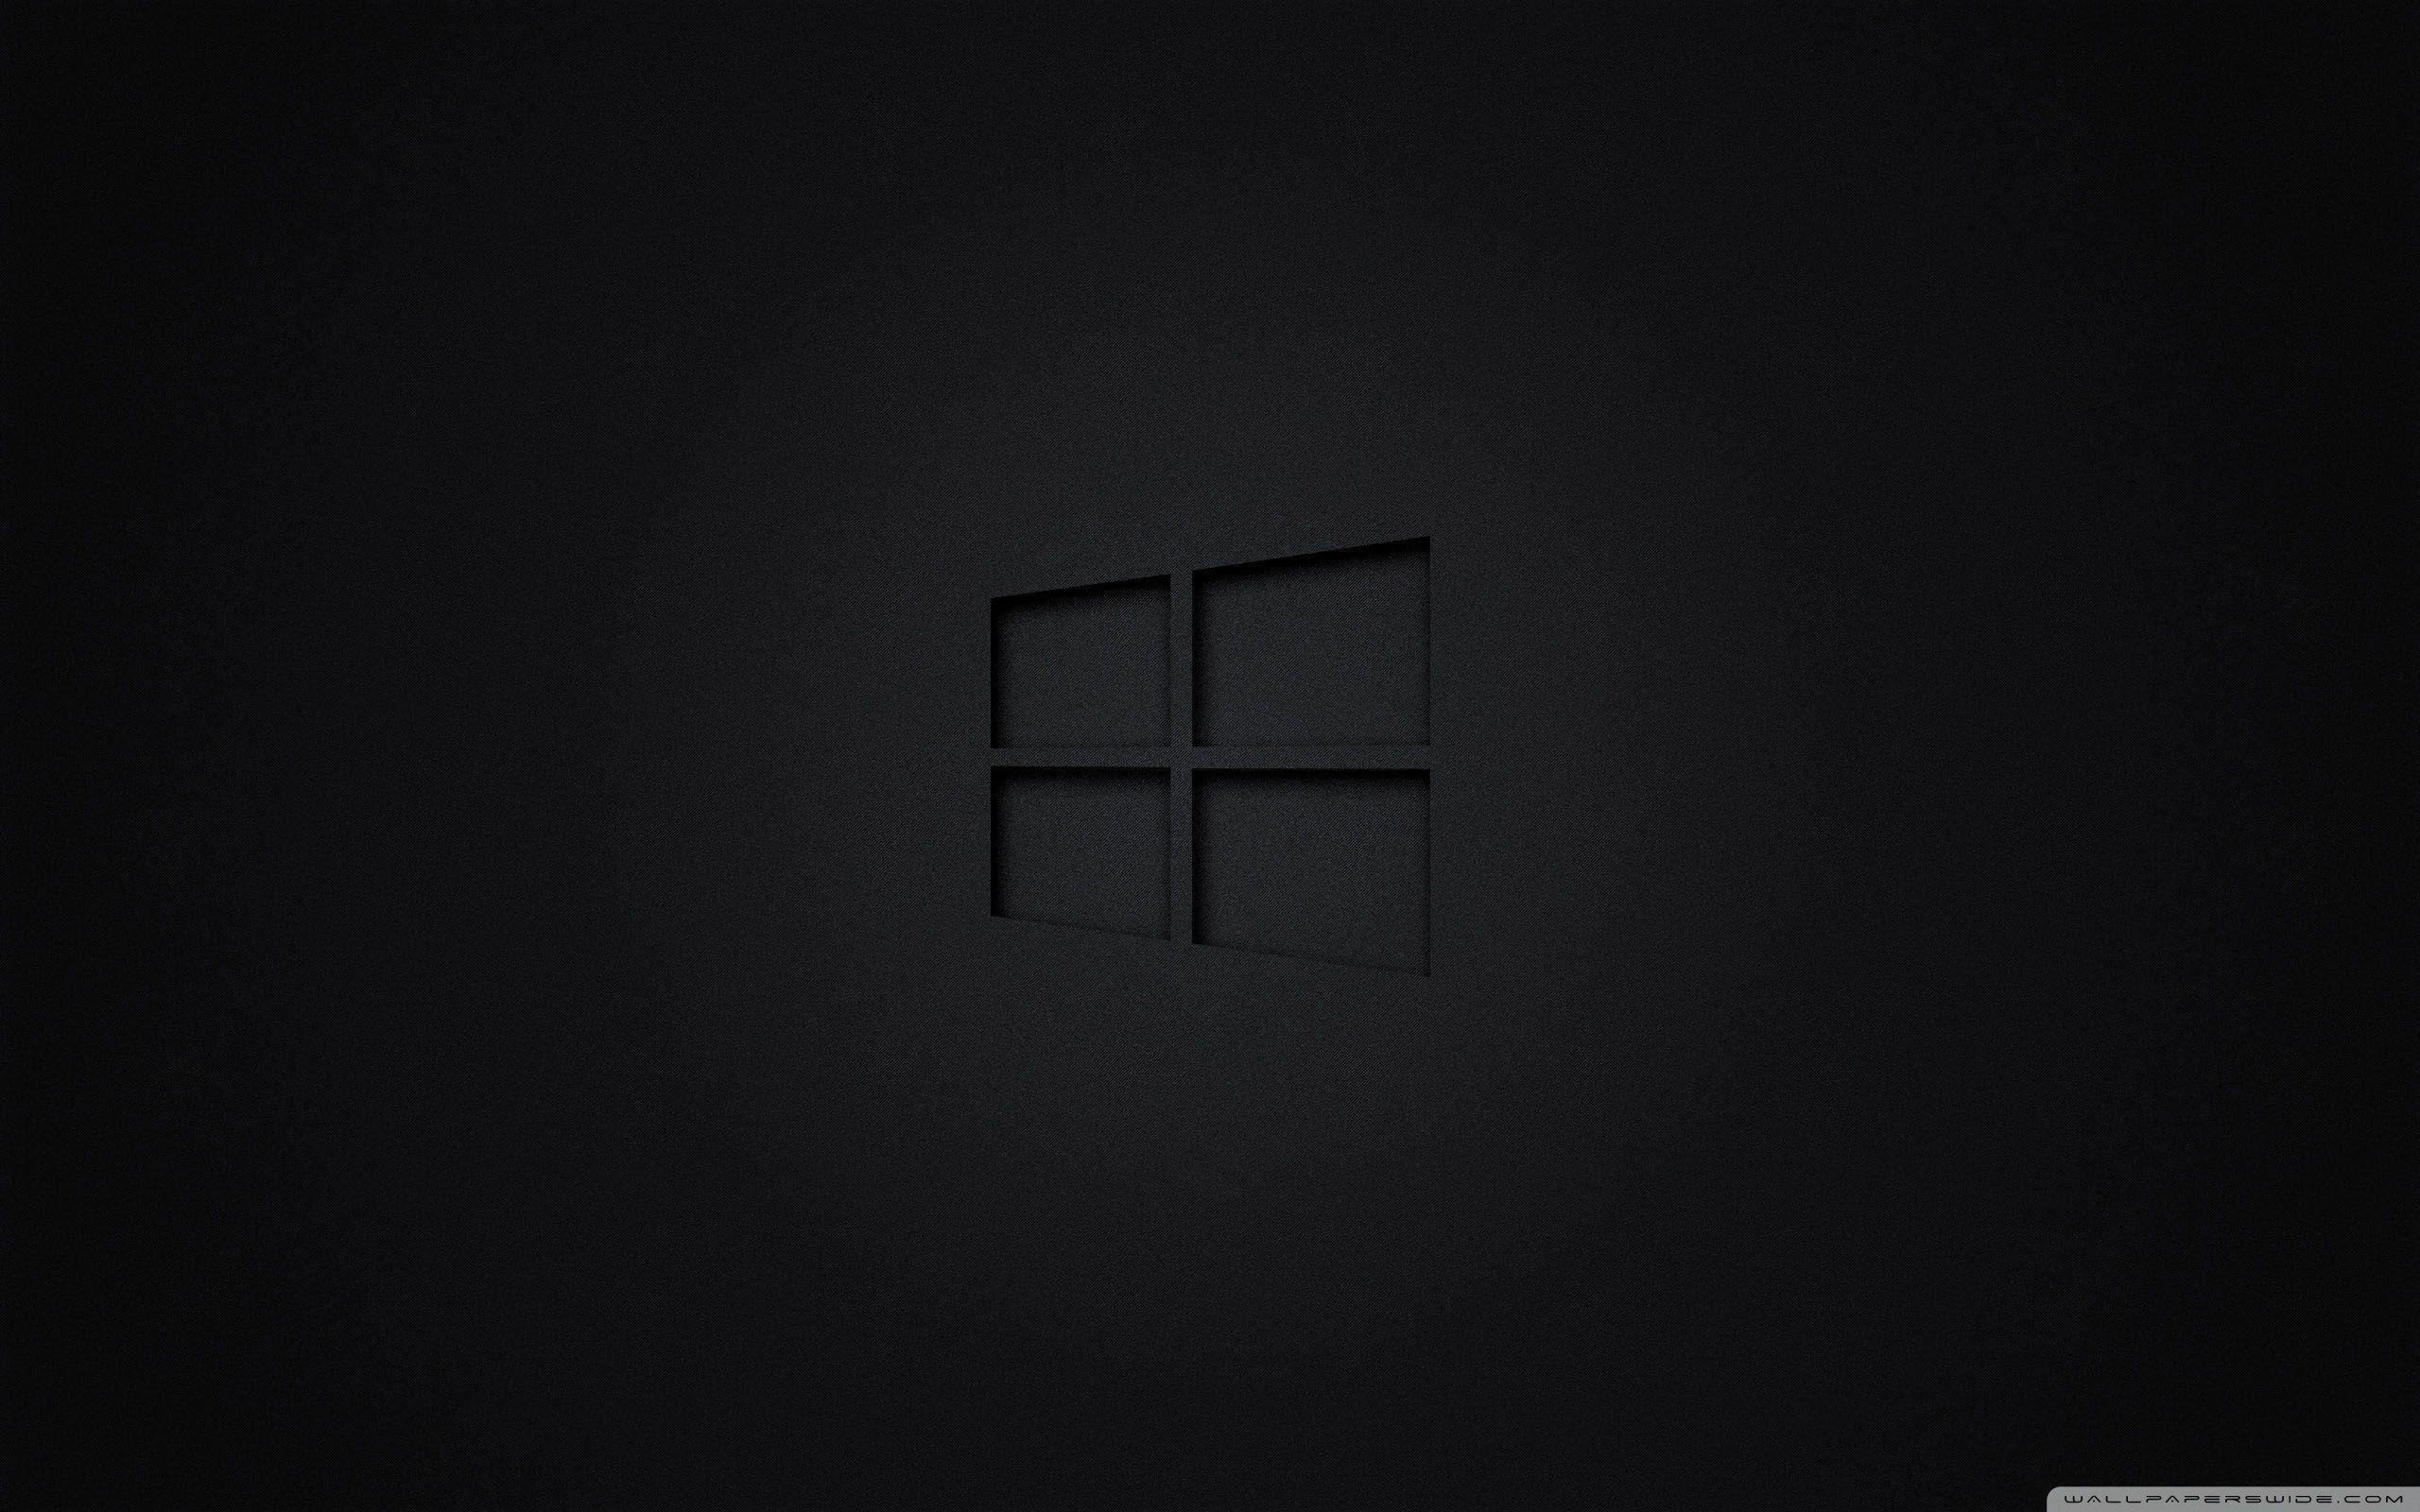 Black Windows Wallpapers - Top Free